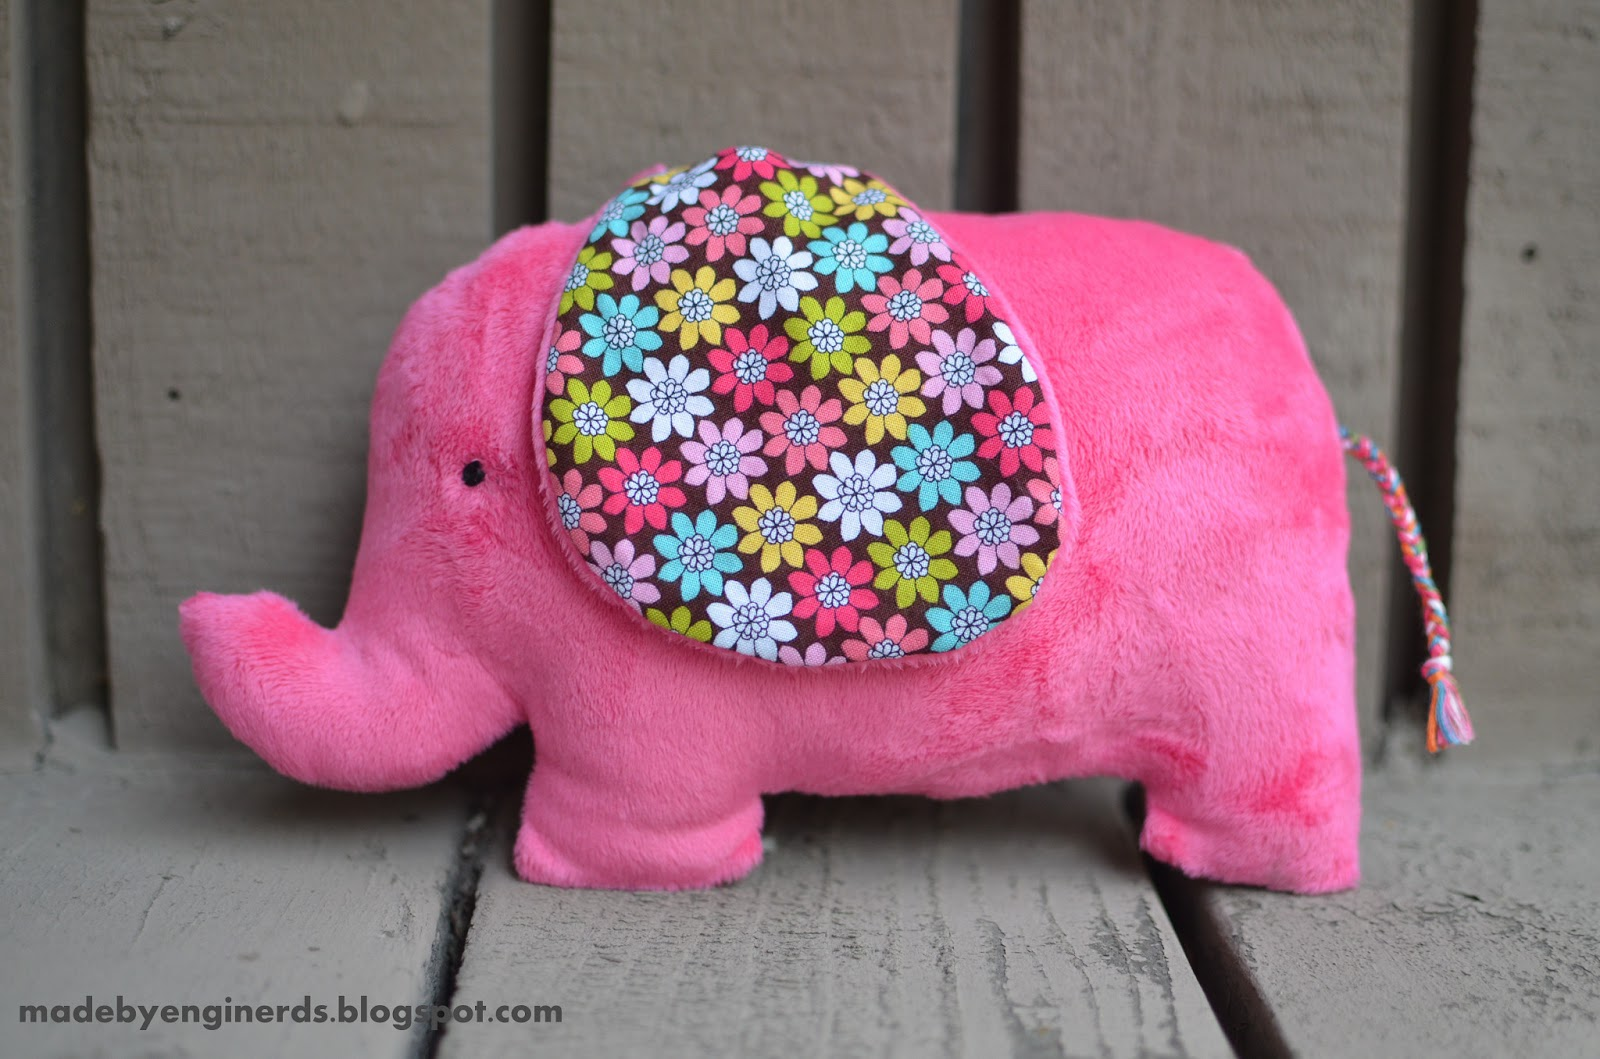 Made by enginerds elephant stuffed animal tutorial with pattern jeuxipadfo Choice Image